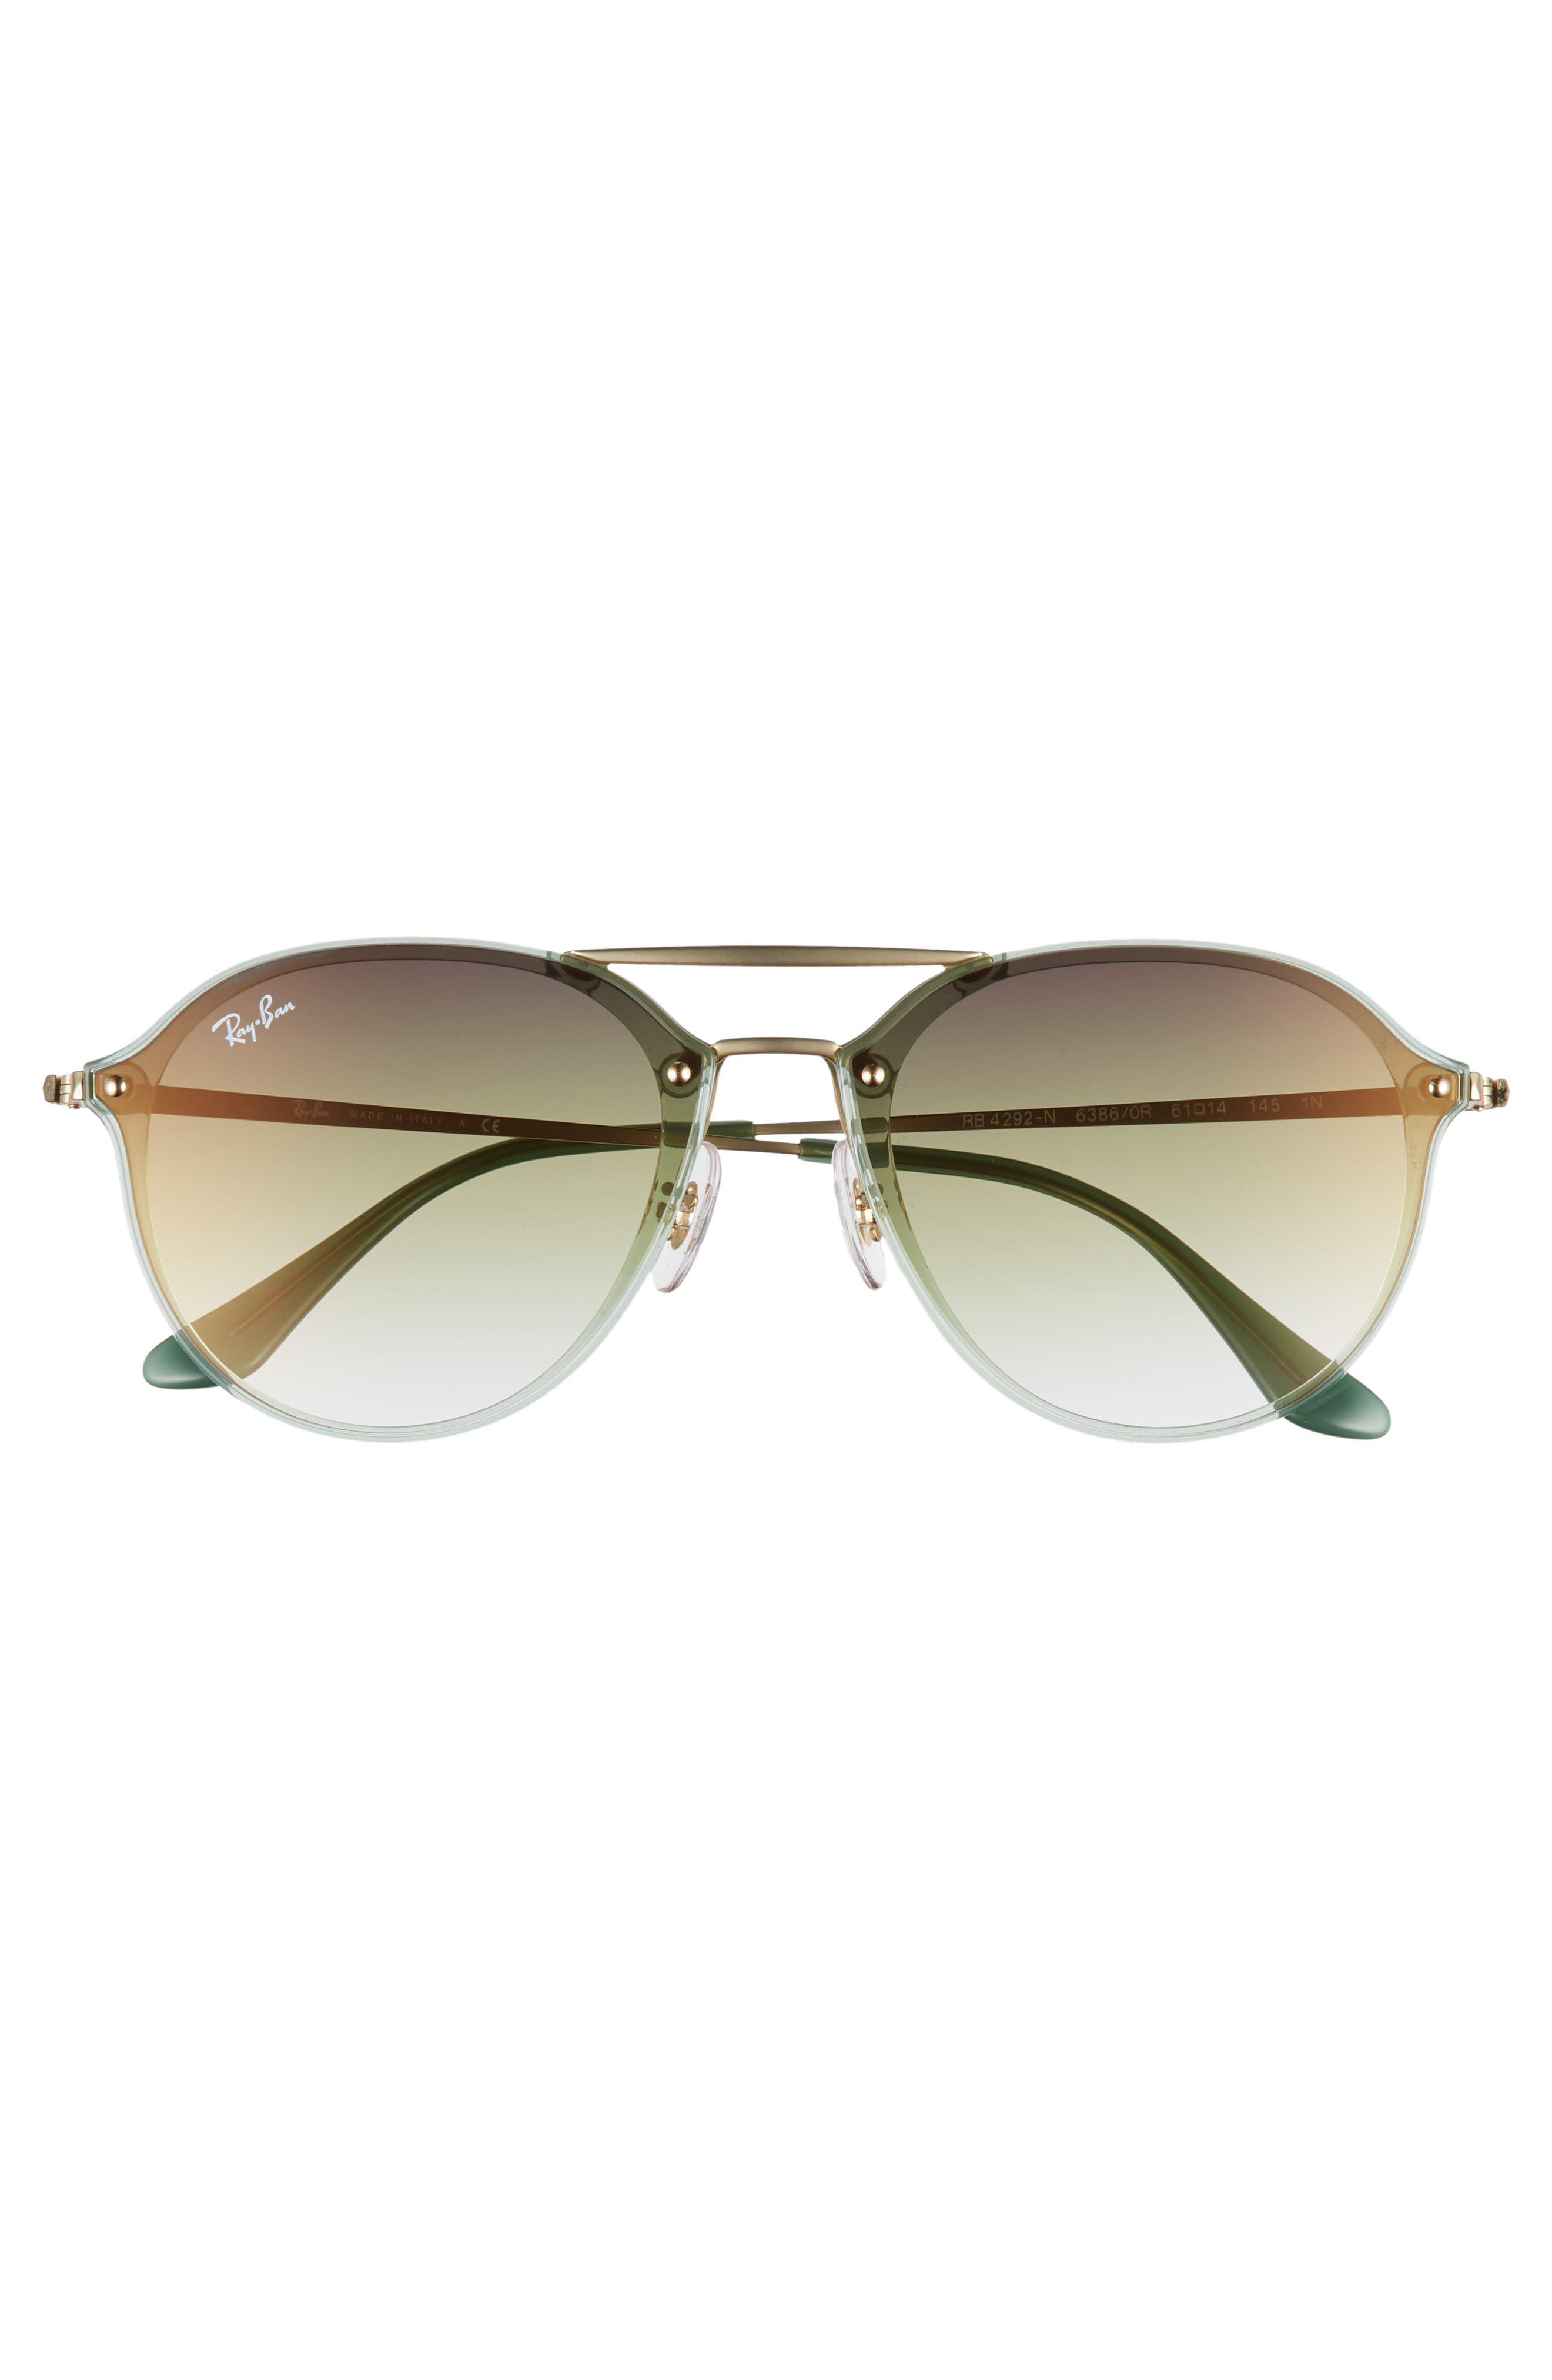 61mm Gradient Aviator Sunglasses,                             Alternate thumbnail 3, color,                             GREEN/ GOLD GRADIENT